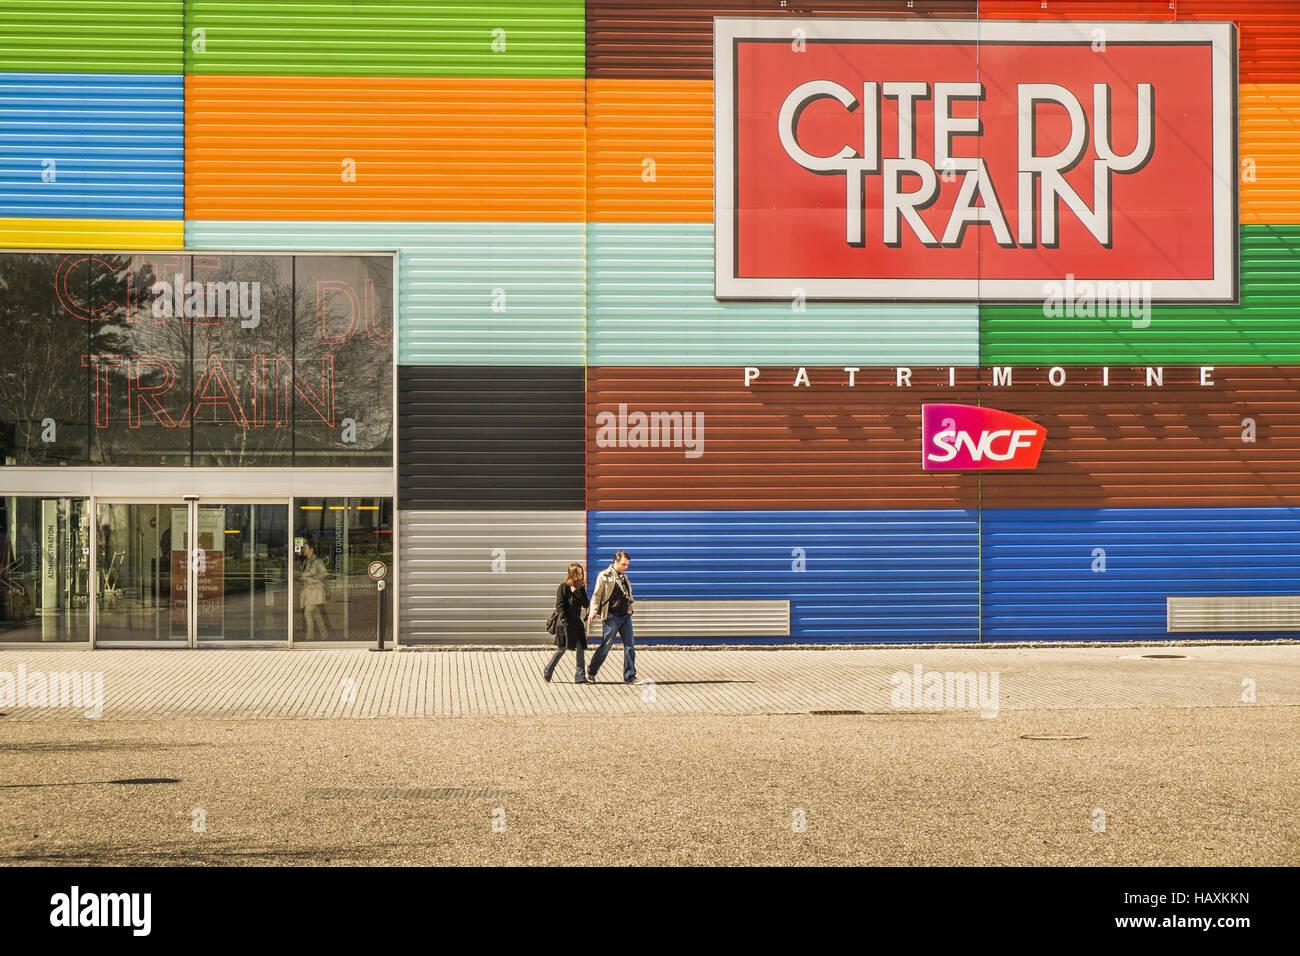 _cite du train_ railroad museum - Stock Image